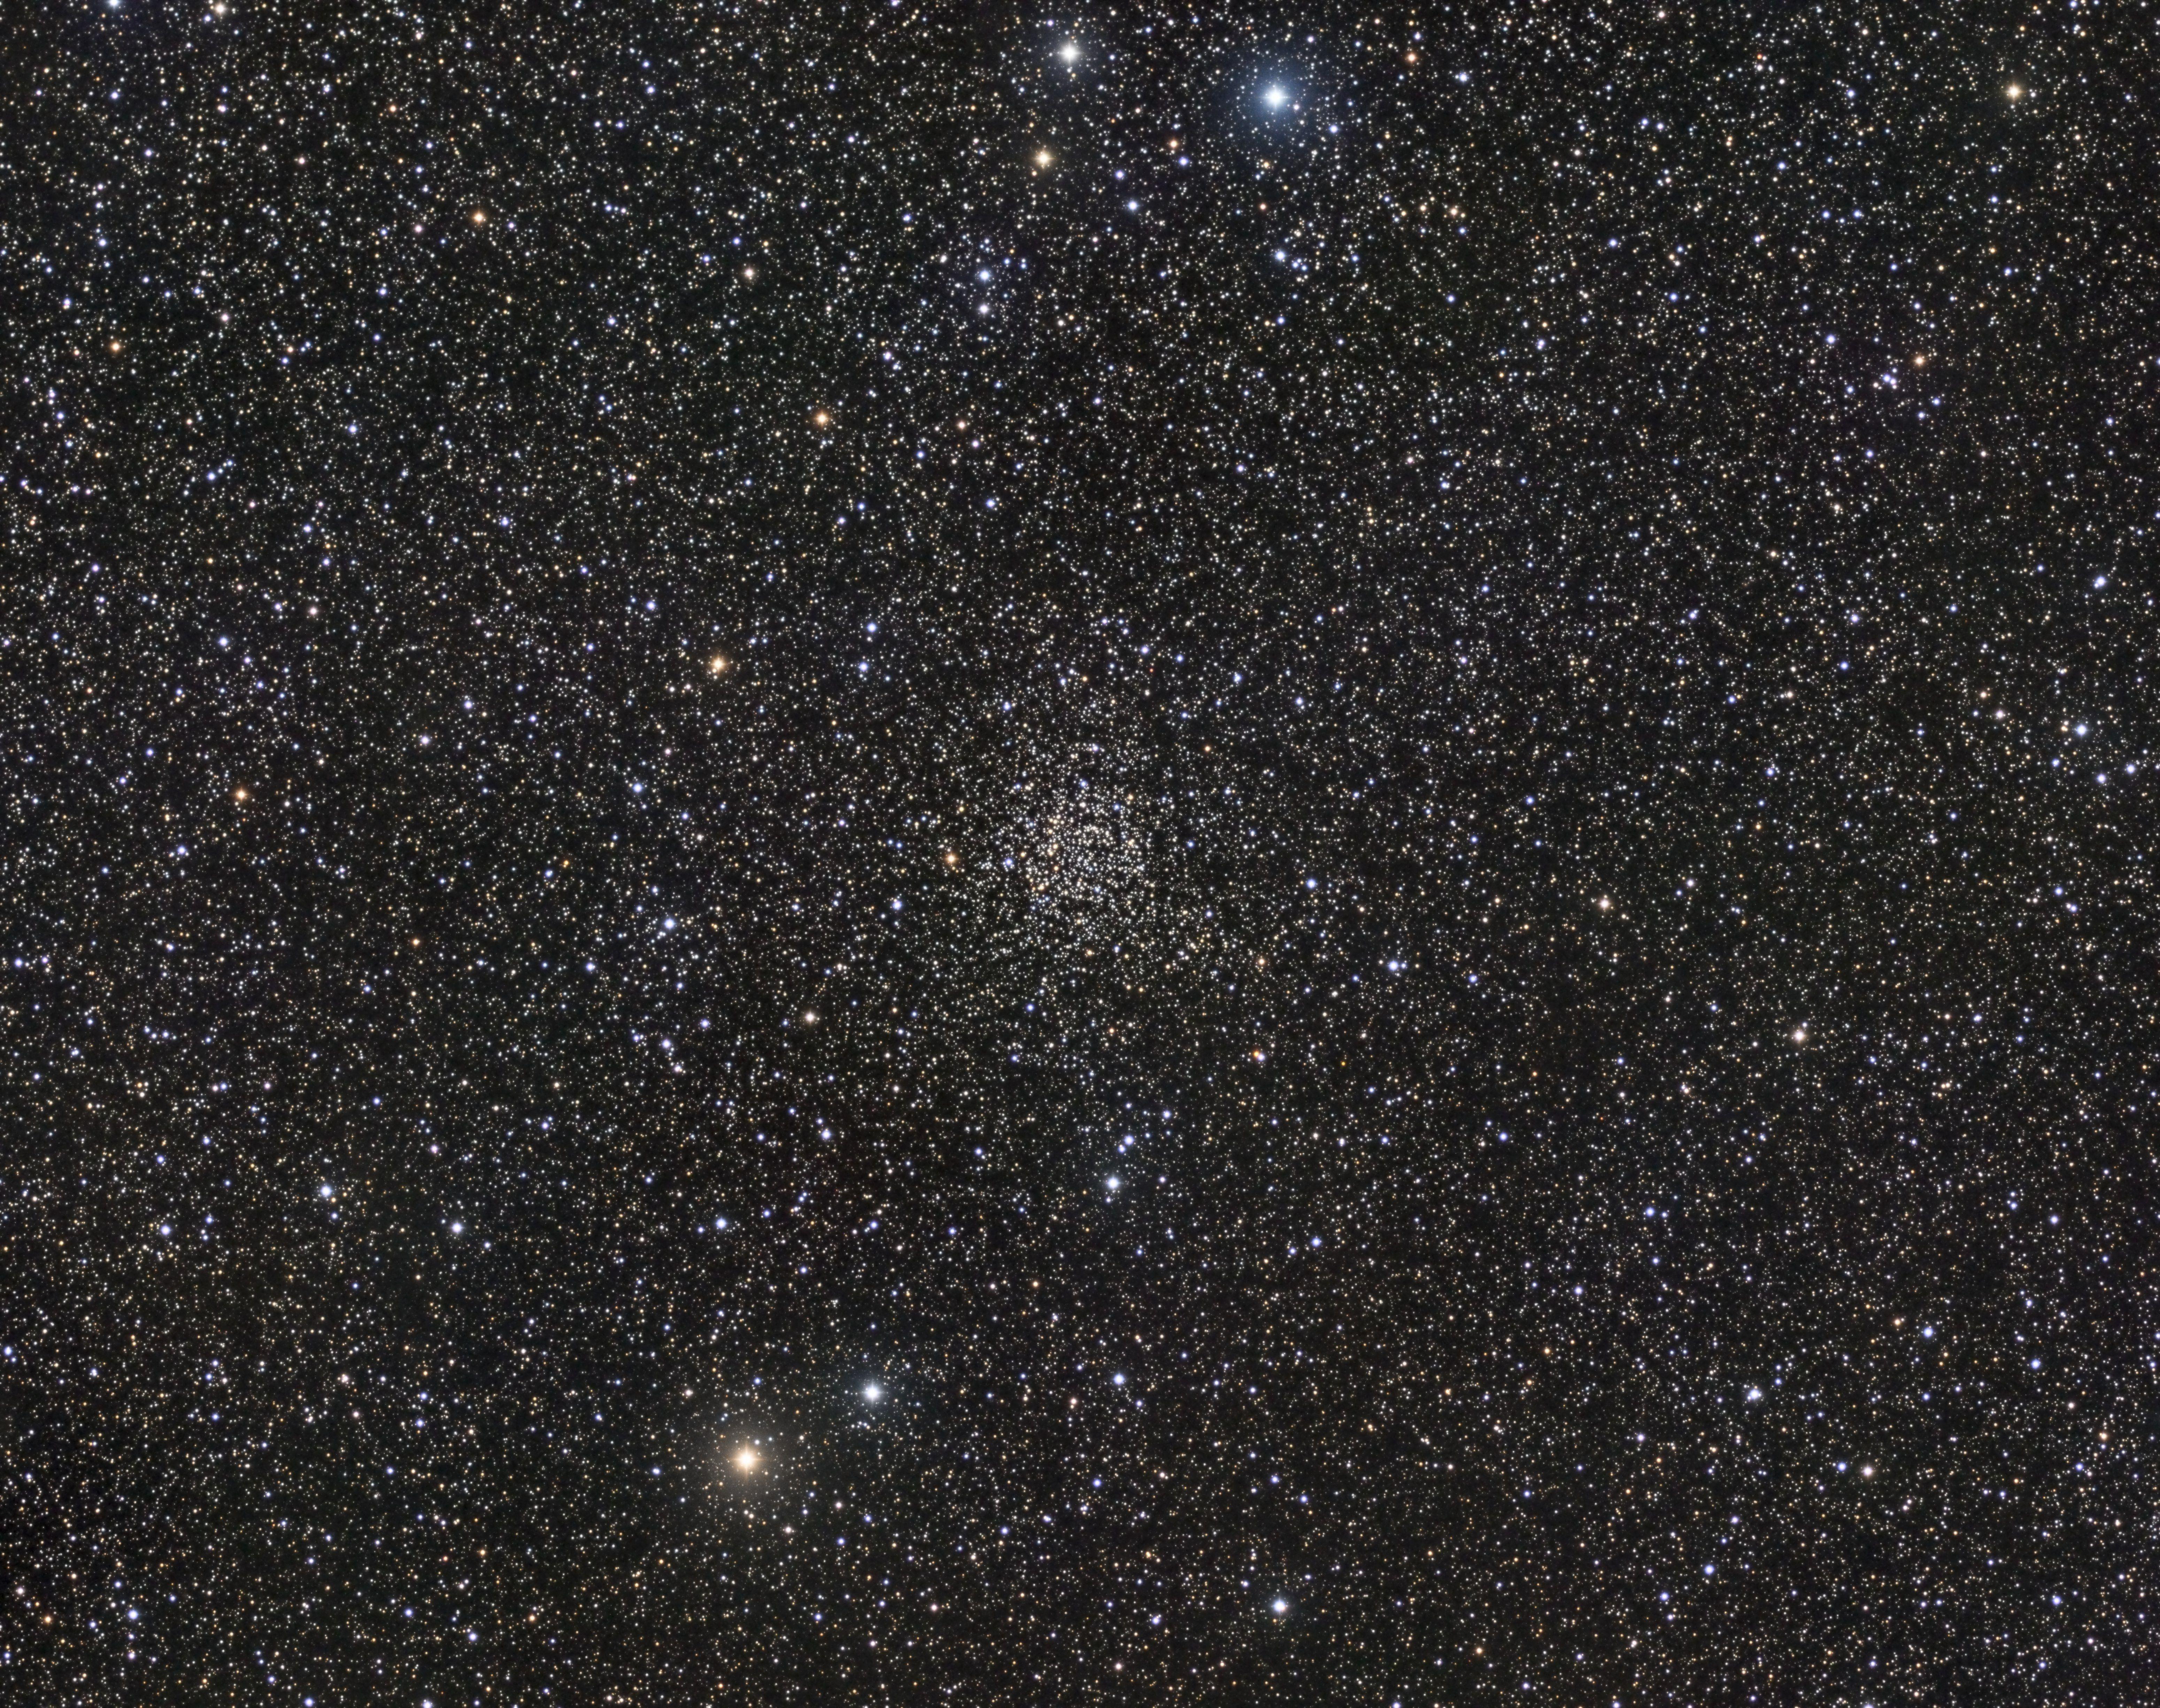 Ngc 7789 carolyns rose cluster 6200x4904osoc http